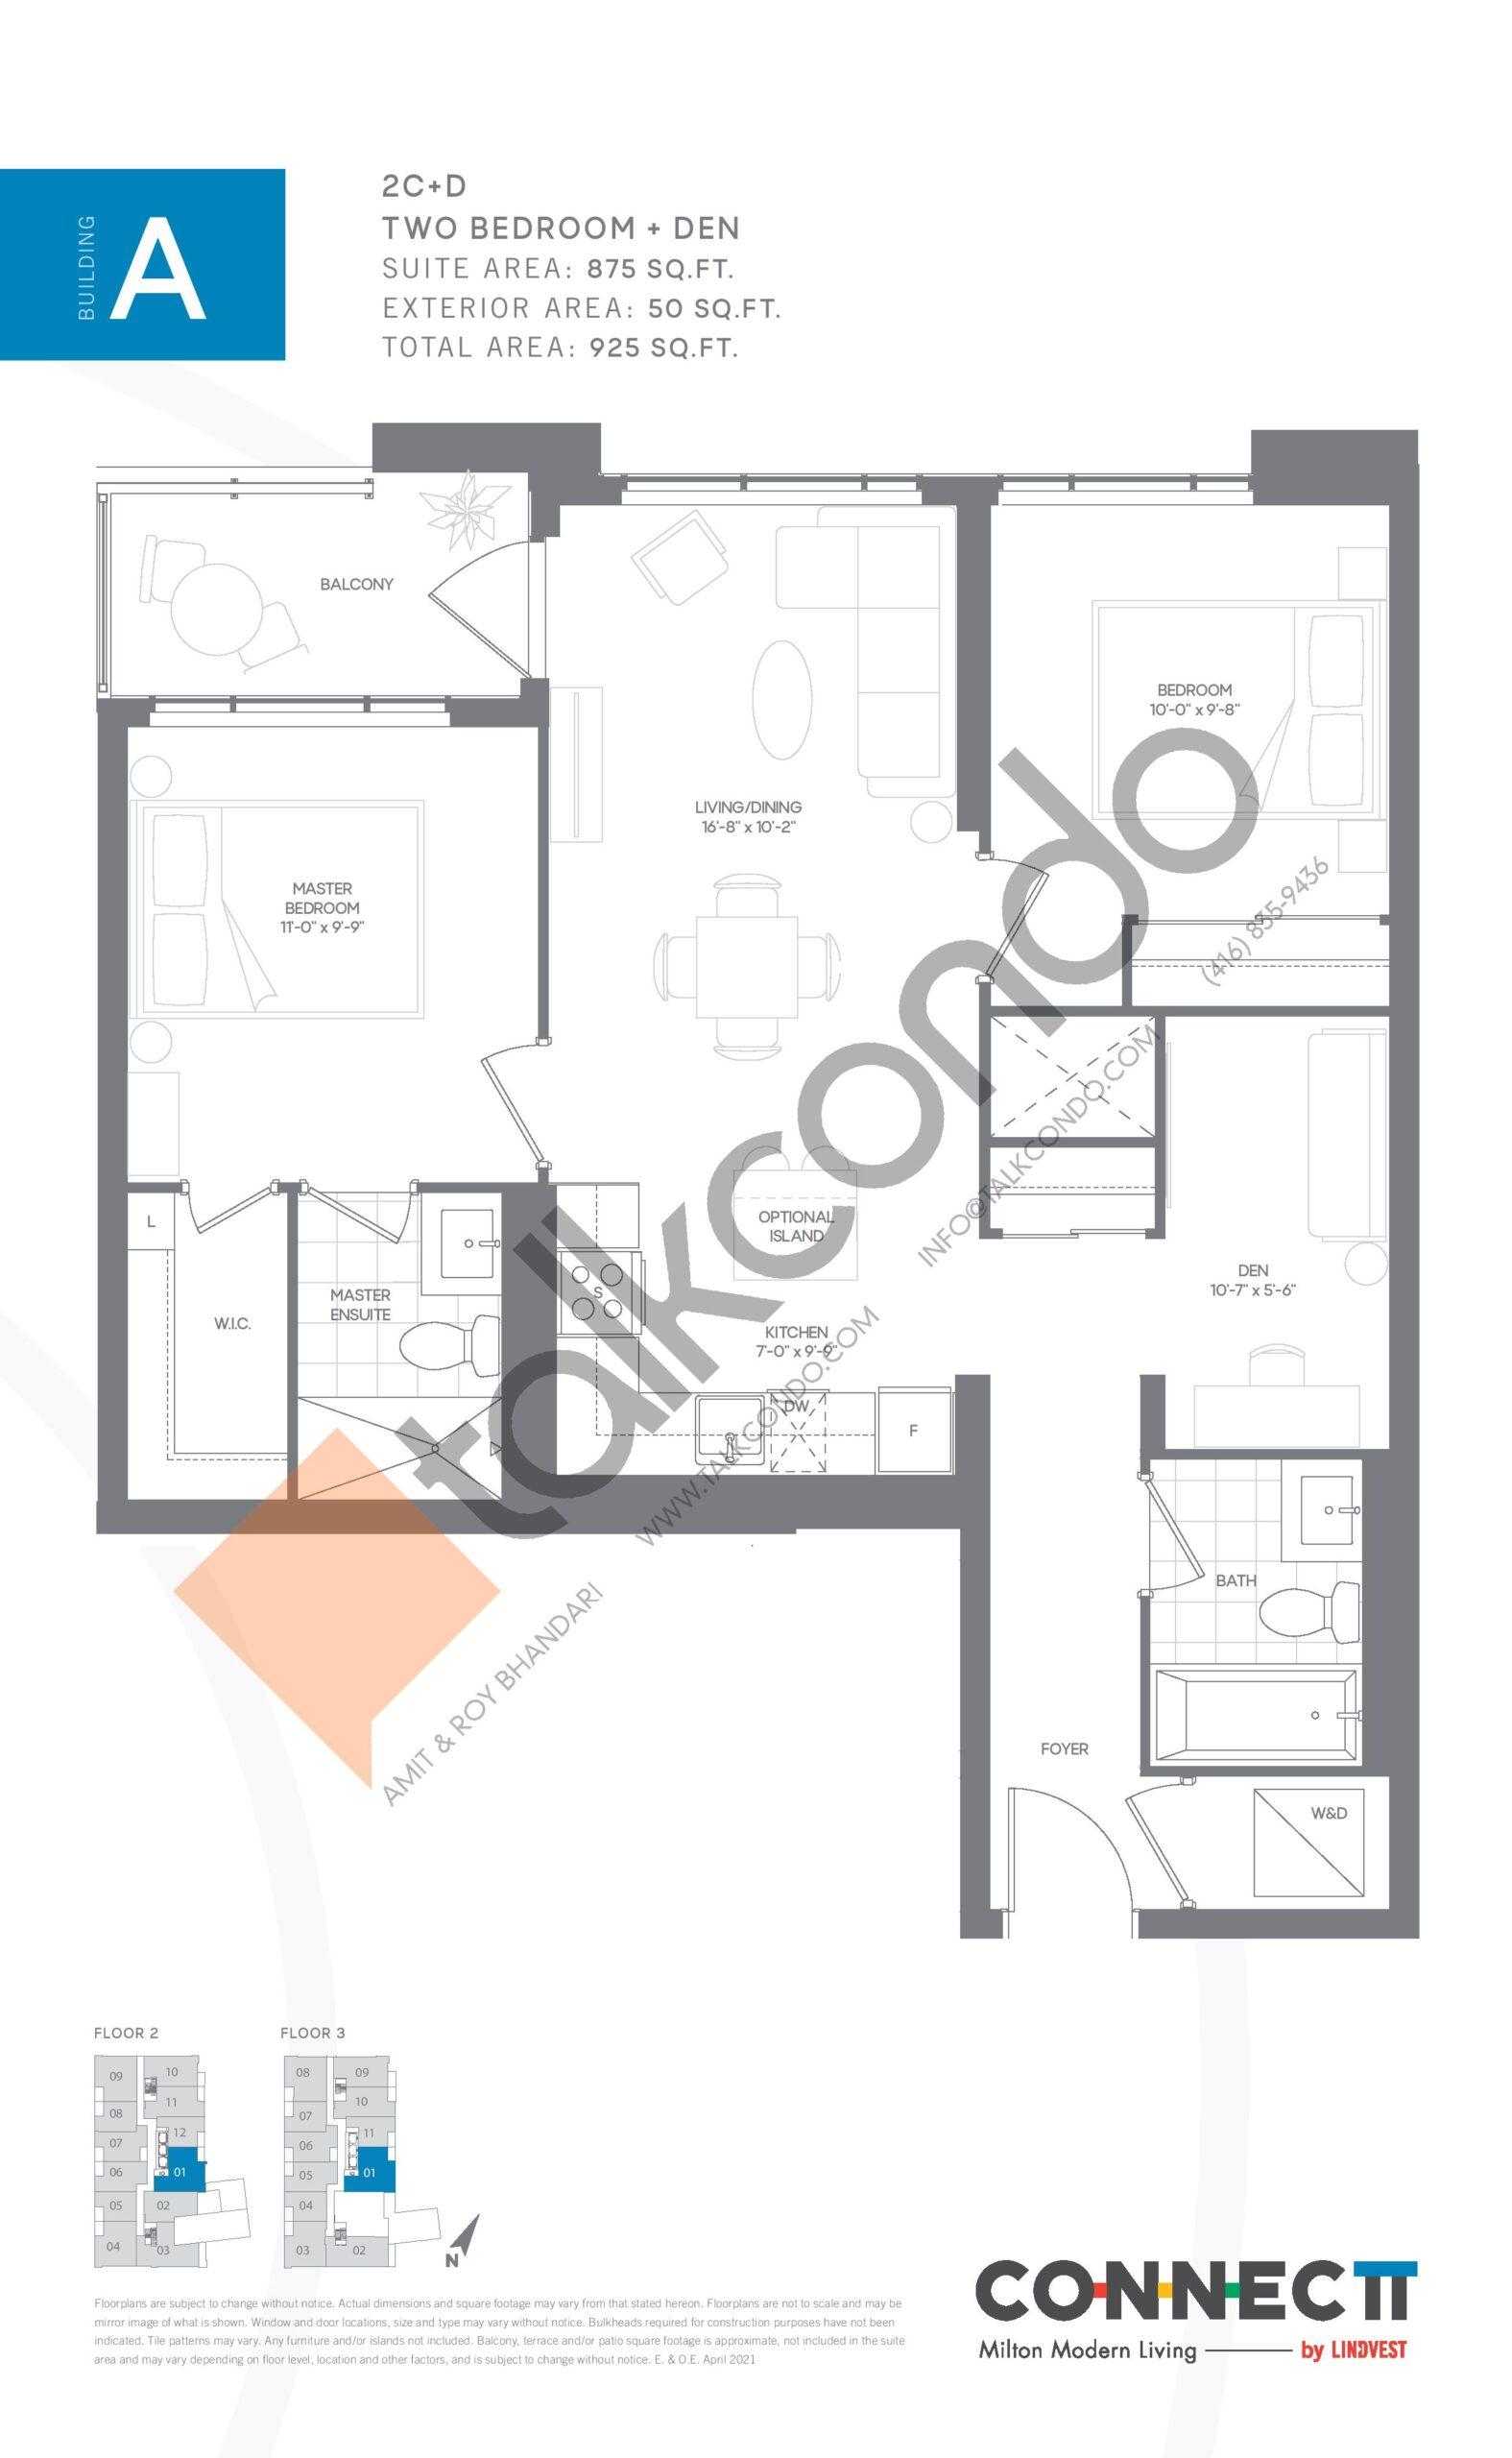 2C+D Floor Plan at Connectt Urban Community Condos - 875 sq.ft